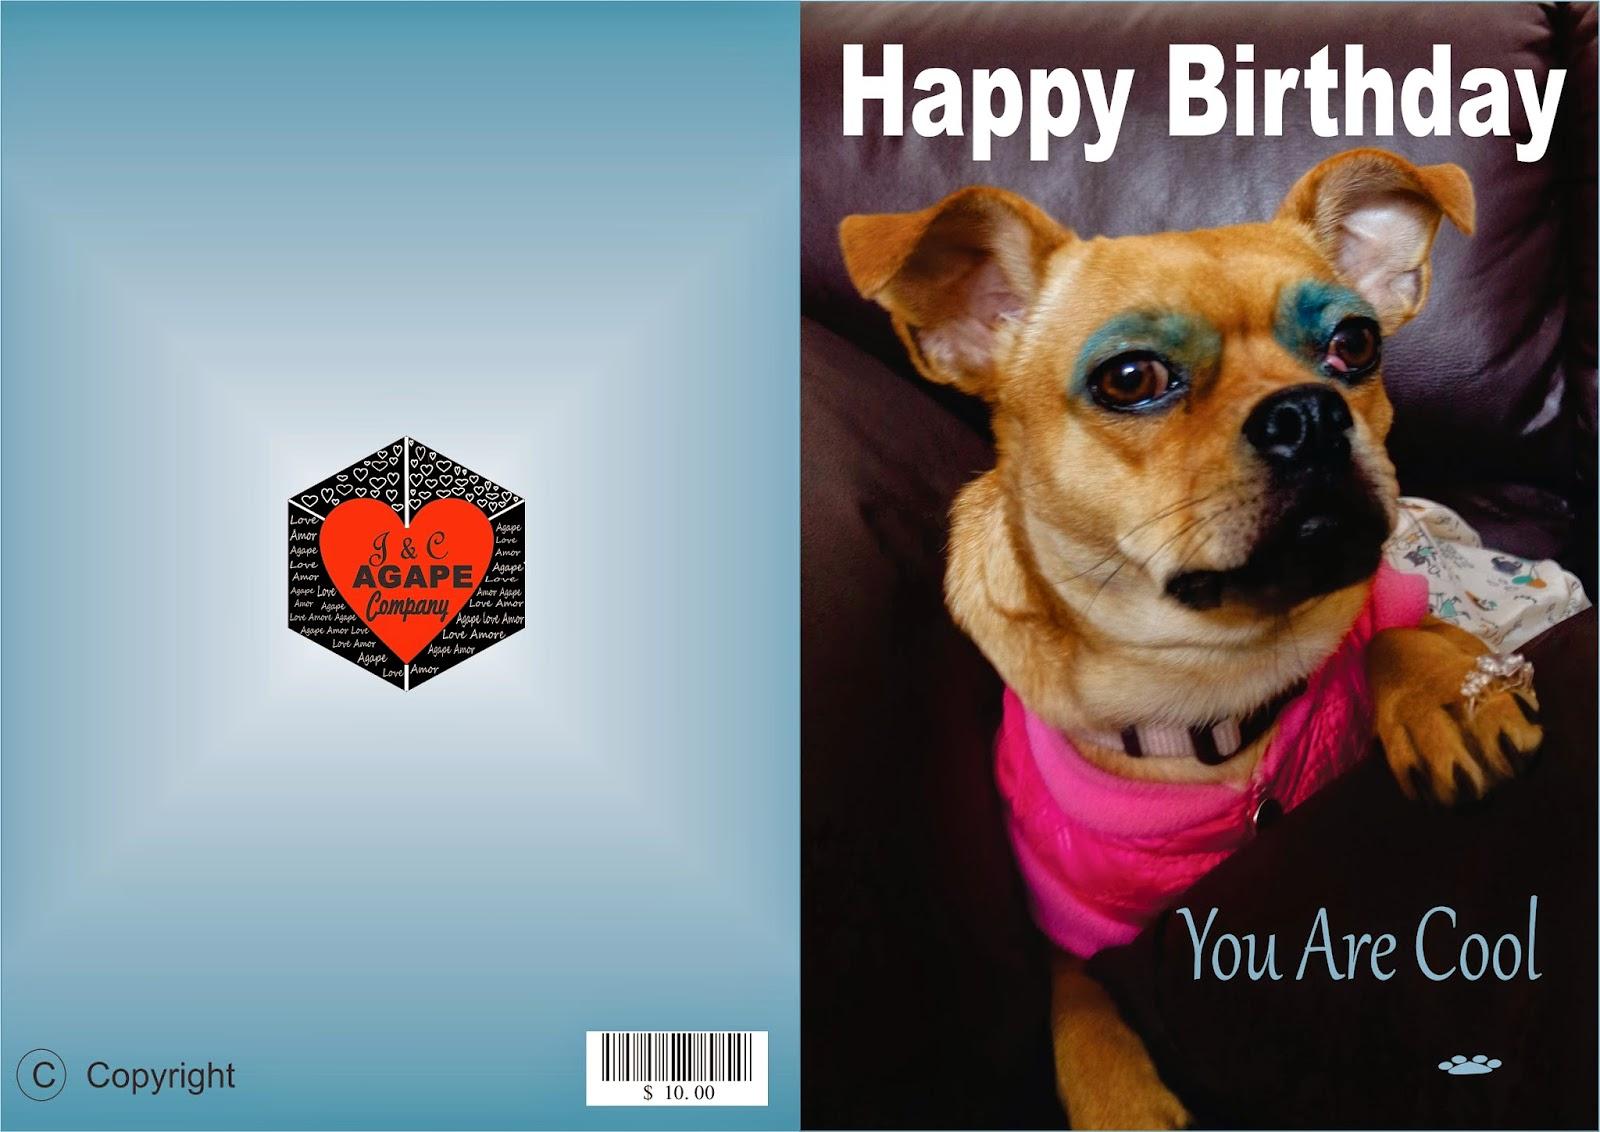 Happy Birthday Feliz Cumpleaños Bon Anniversaire ~ Greeting cards print at home: happy birthday feliz cumpleaños